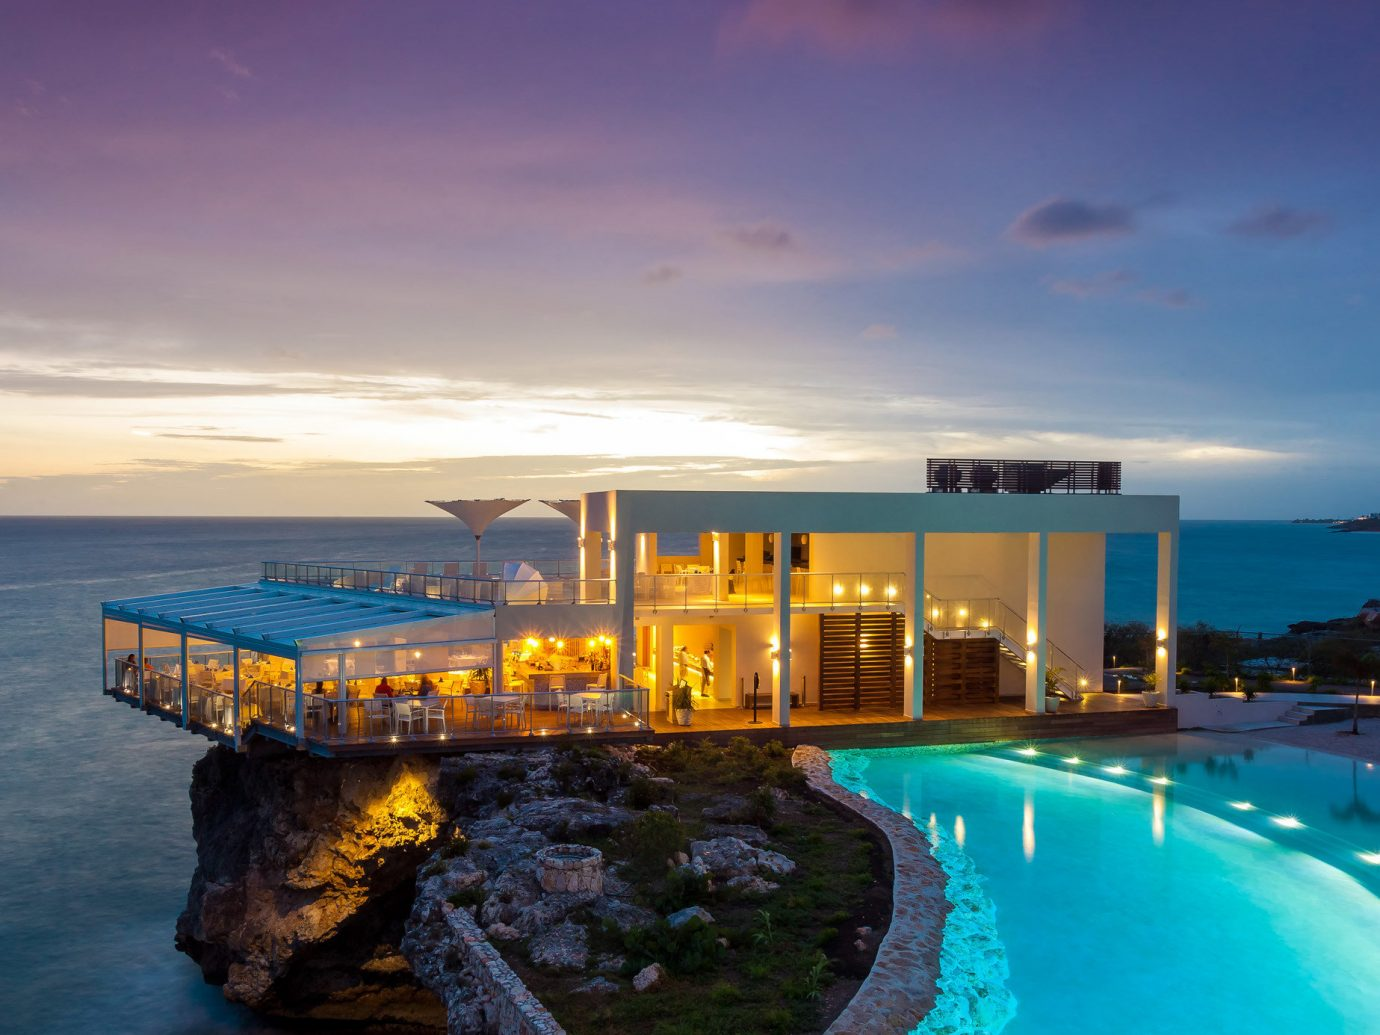 Trip Ideas water sky Sea Ocean outdoor Beach horizon vacation Coast bay dusk swimming pool caribbean evening Resort estate